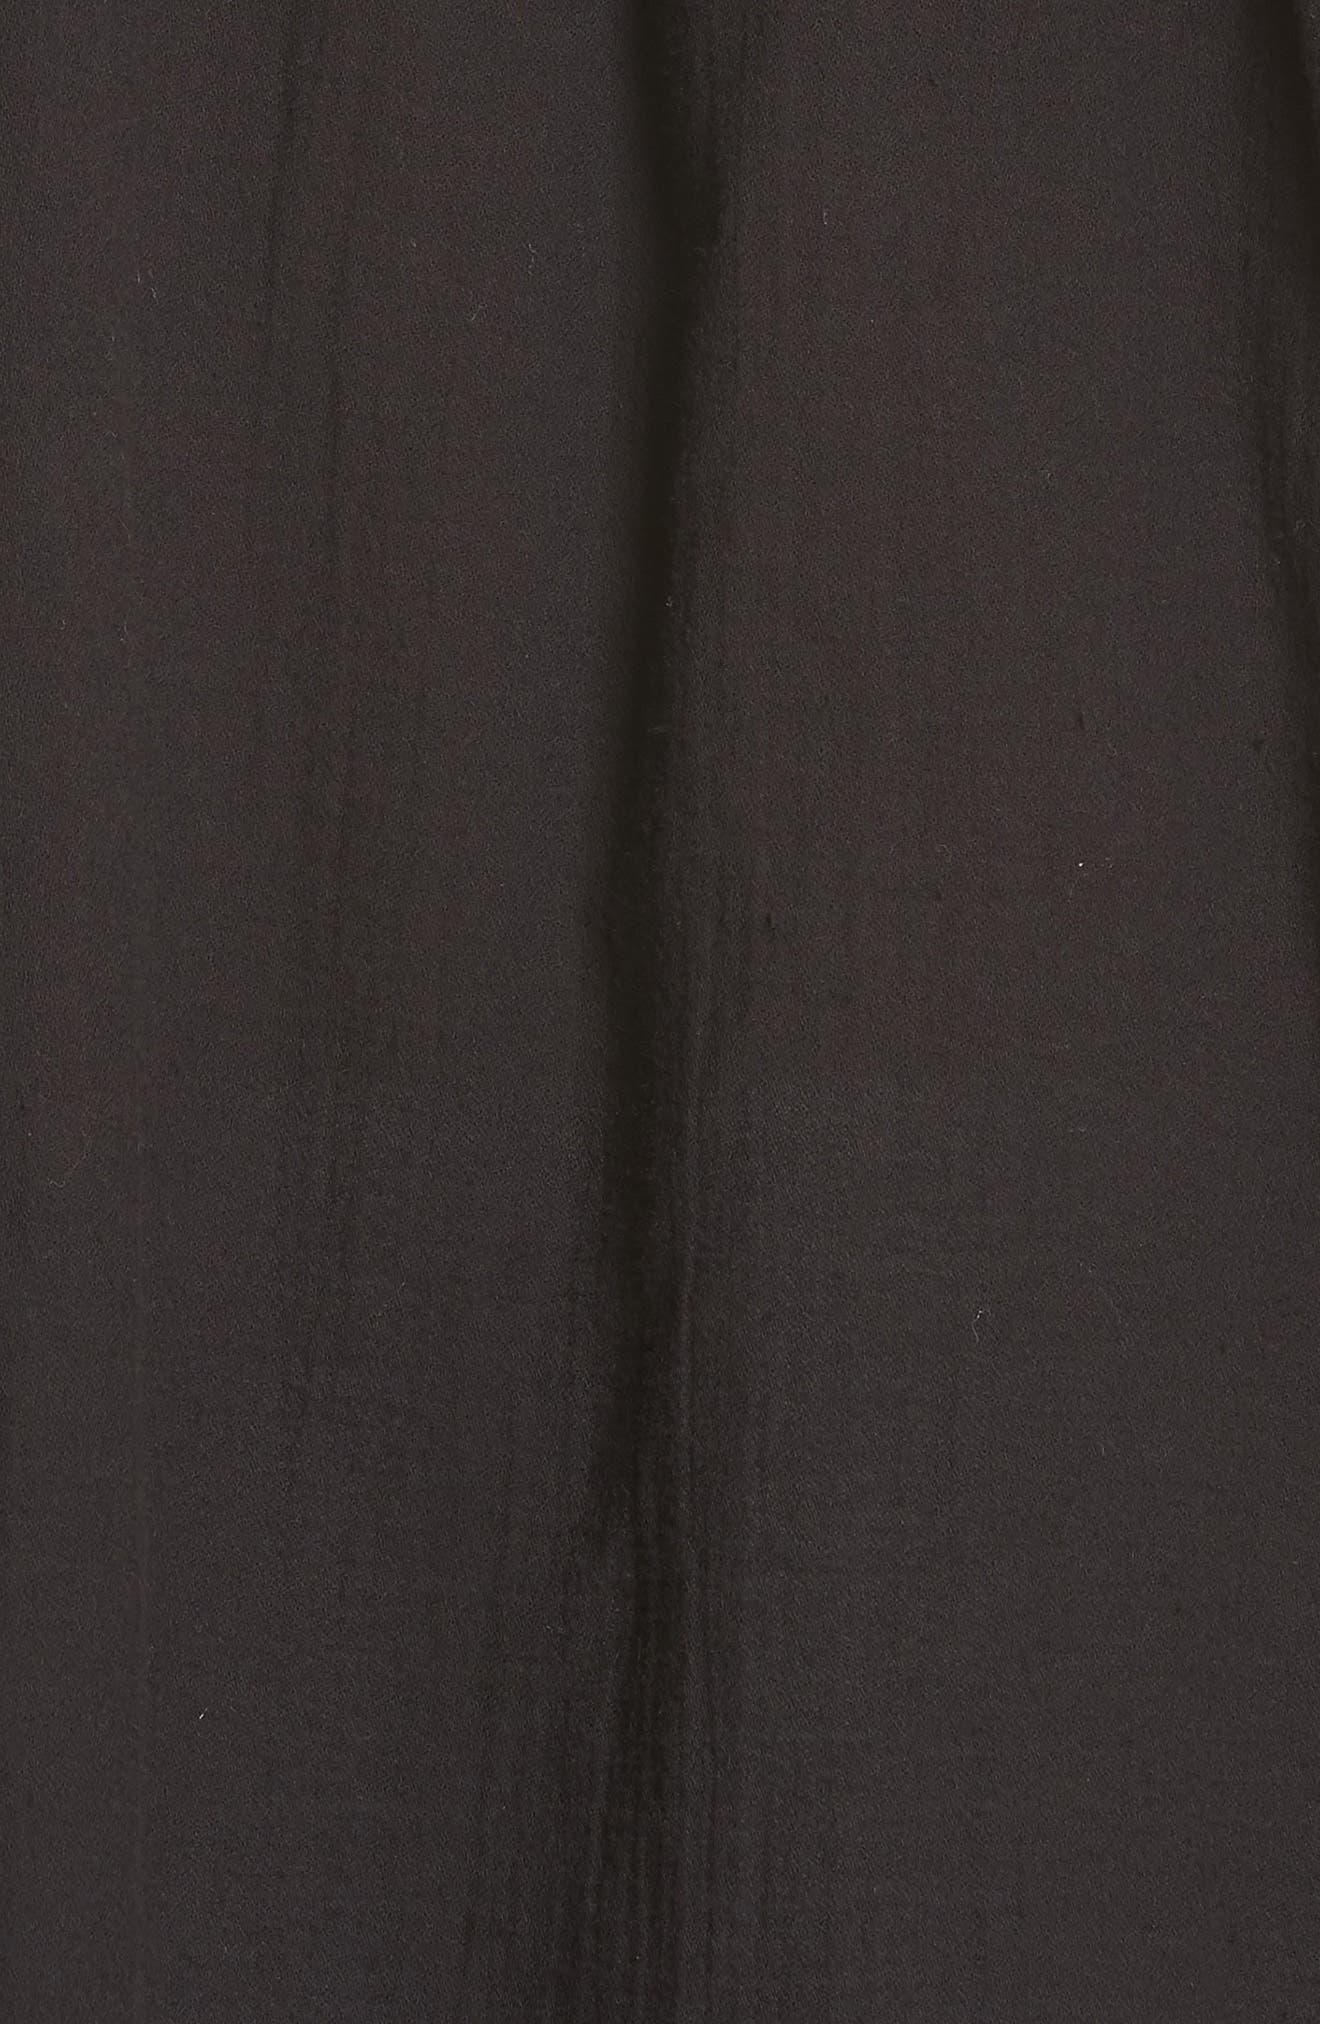 Topstitch Crinkle Cotton Top,                             Alternate thumbnail 5, color,                             Black